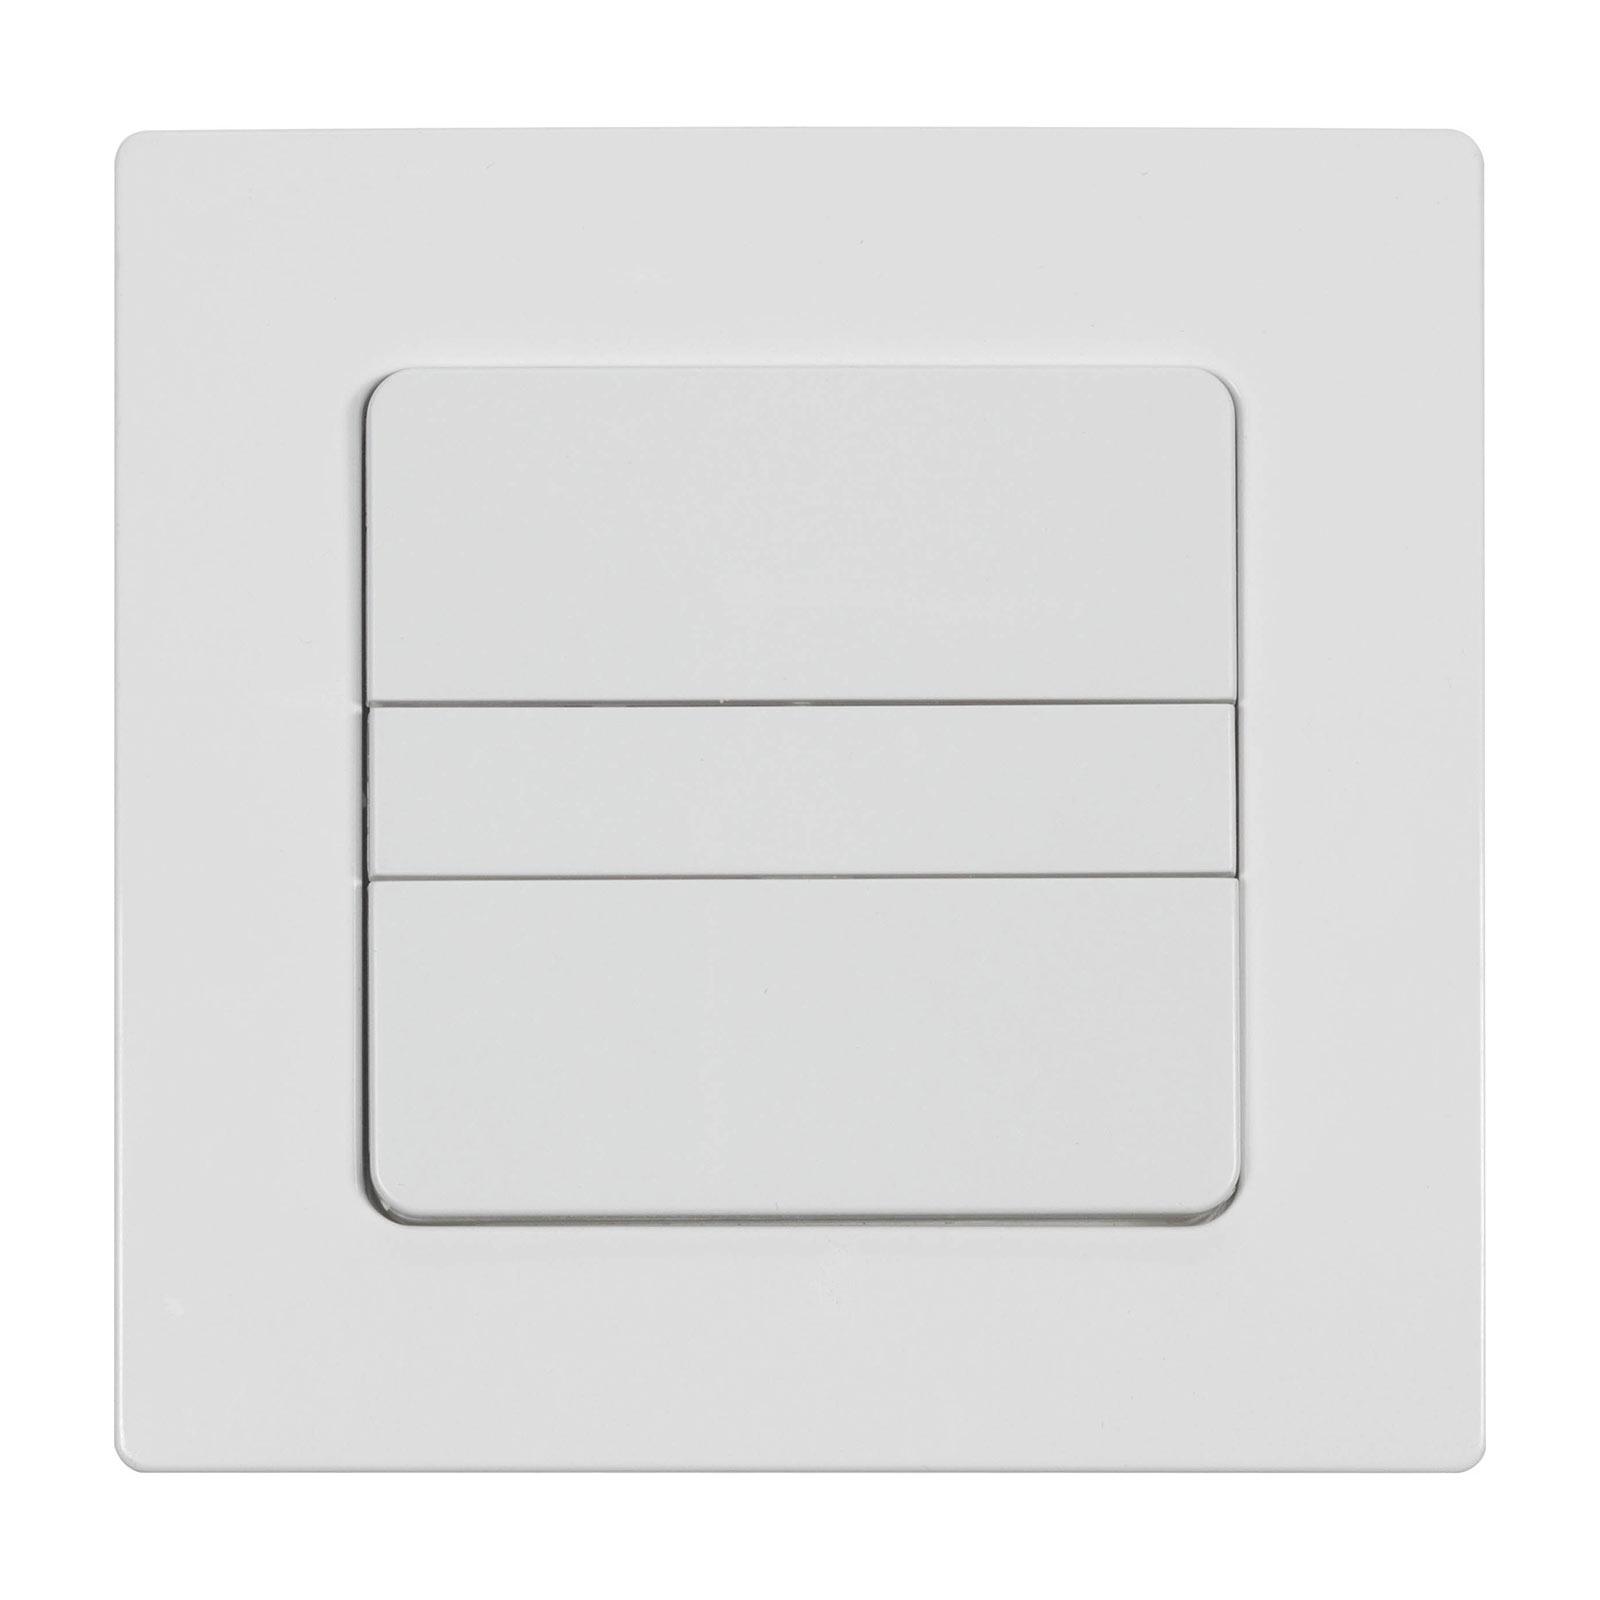 Rademacher DuoFern wall switch 1-channel battery_8038012_1